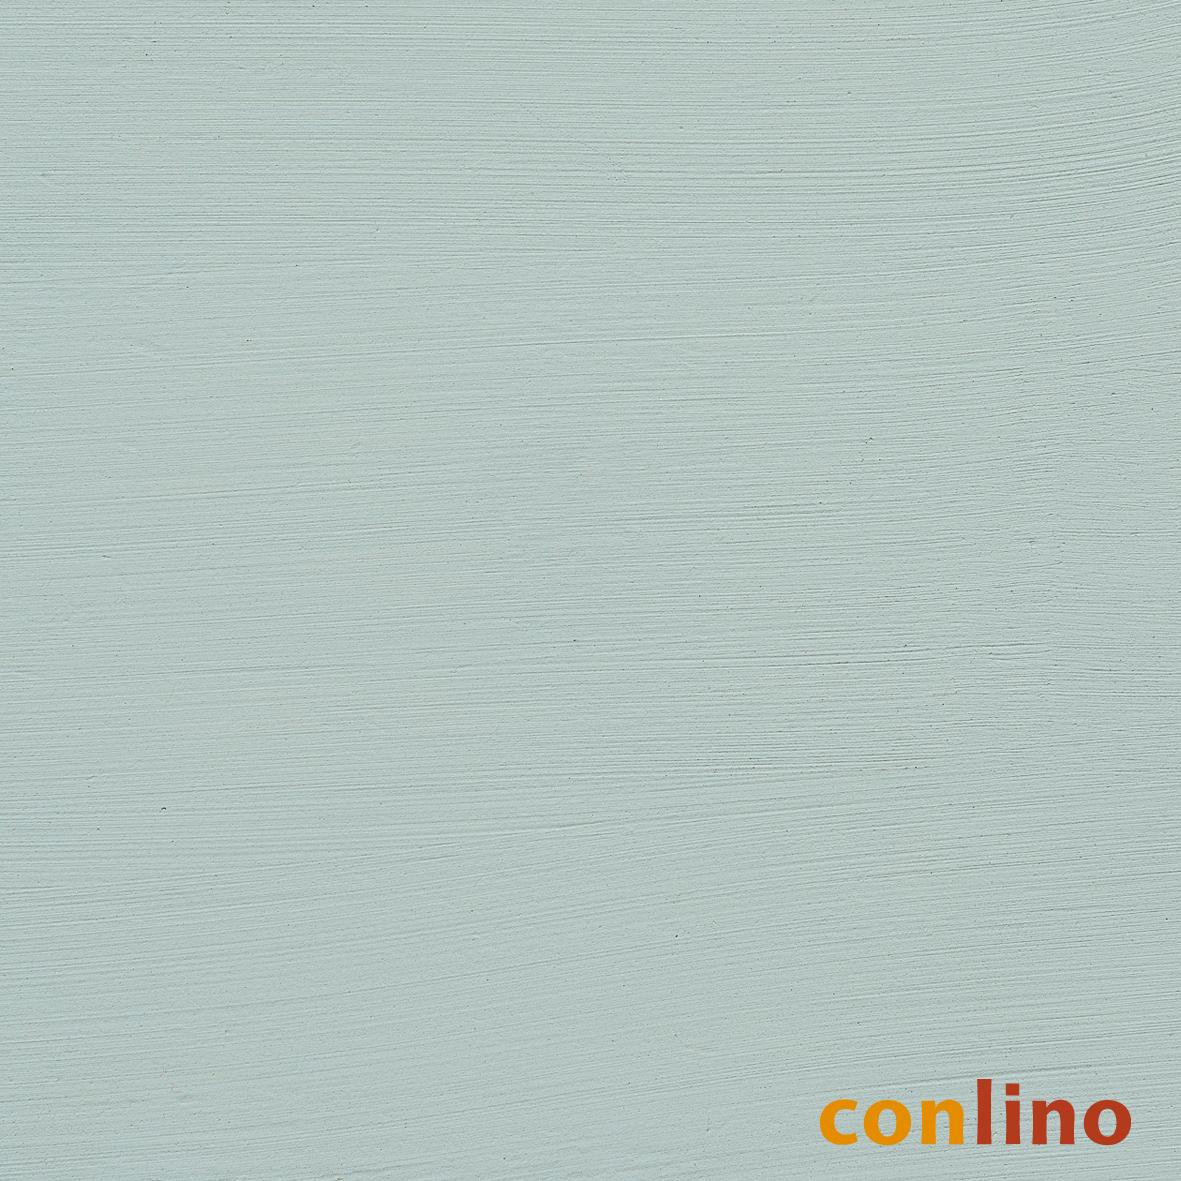 conluto Lehmfarbe Muschel CL 146